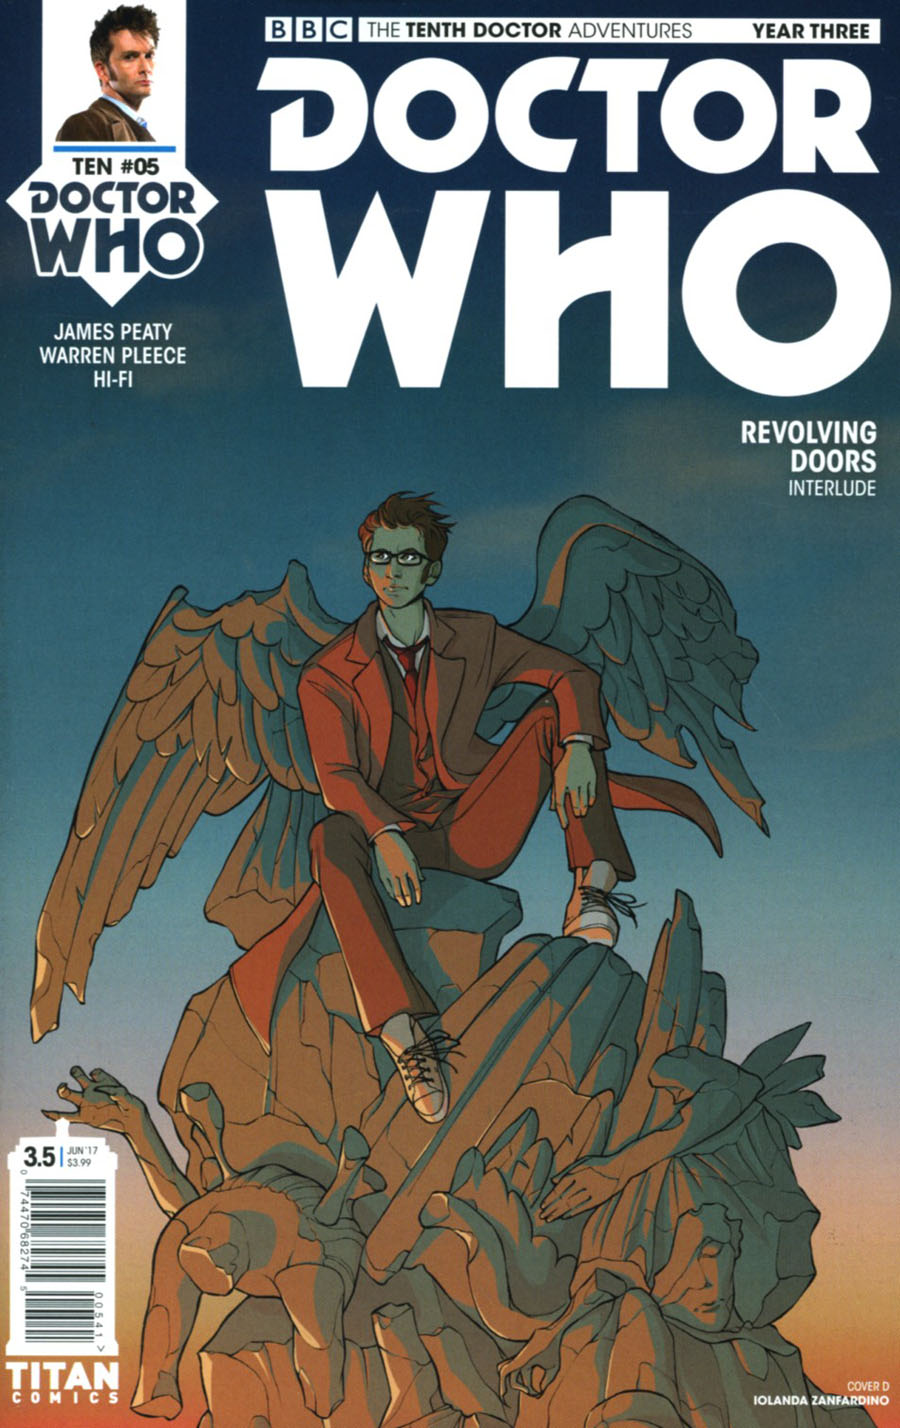 Doctor Who 10th Doctor Year Three #5 Cover D Variant Iolanda Zanfardino Cover